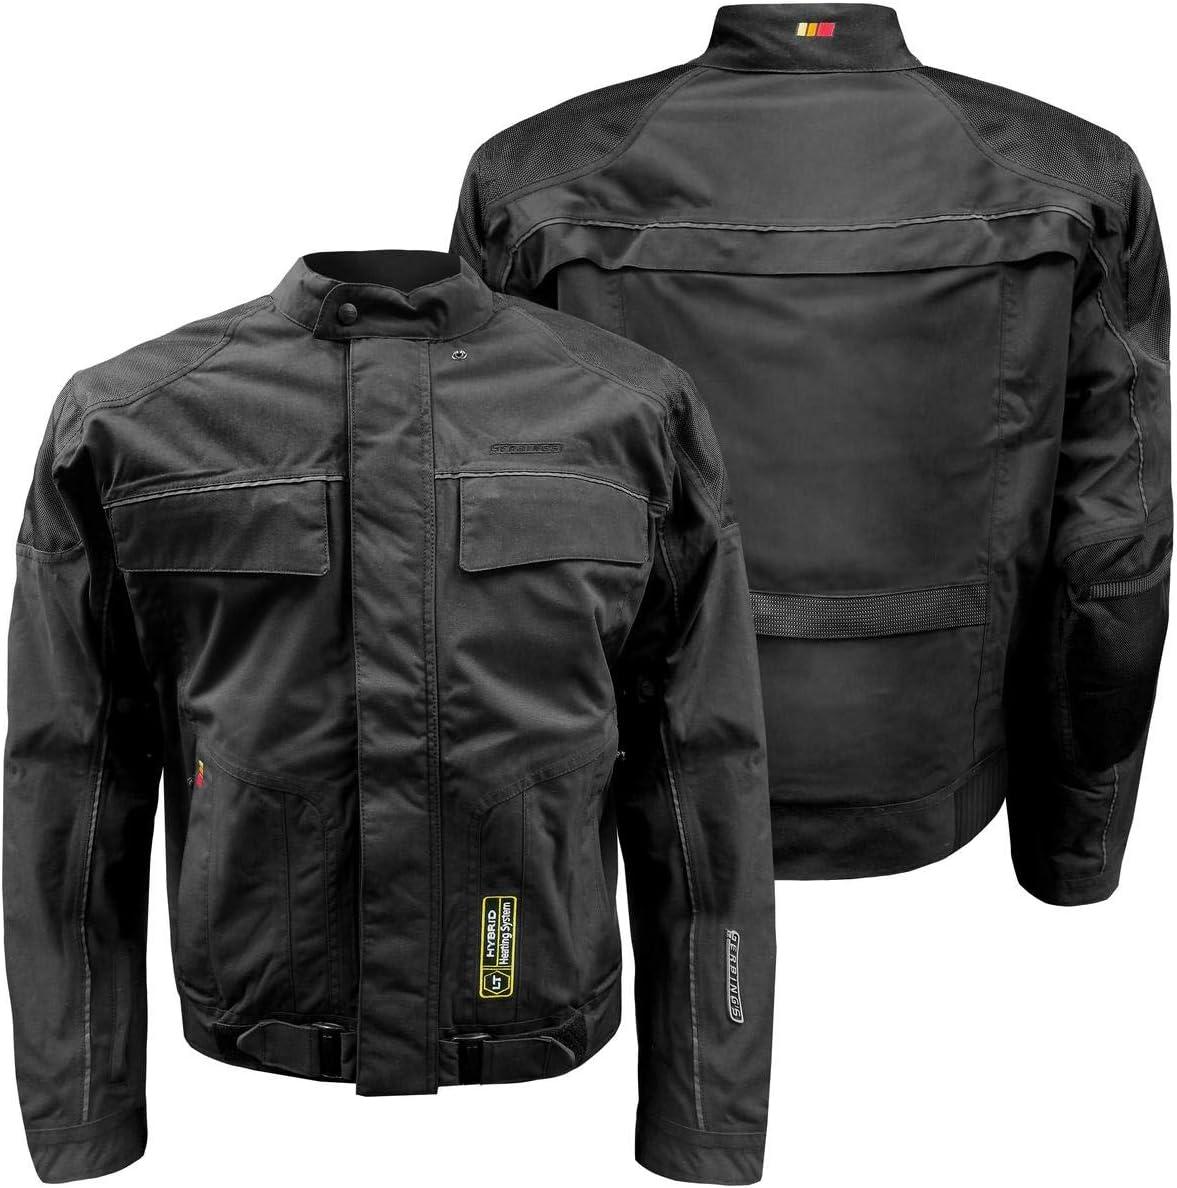 Gerbing 12V Mens Hybrid LT Heated Motorcycle Jacket